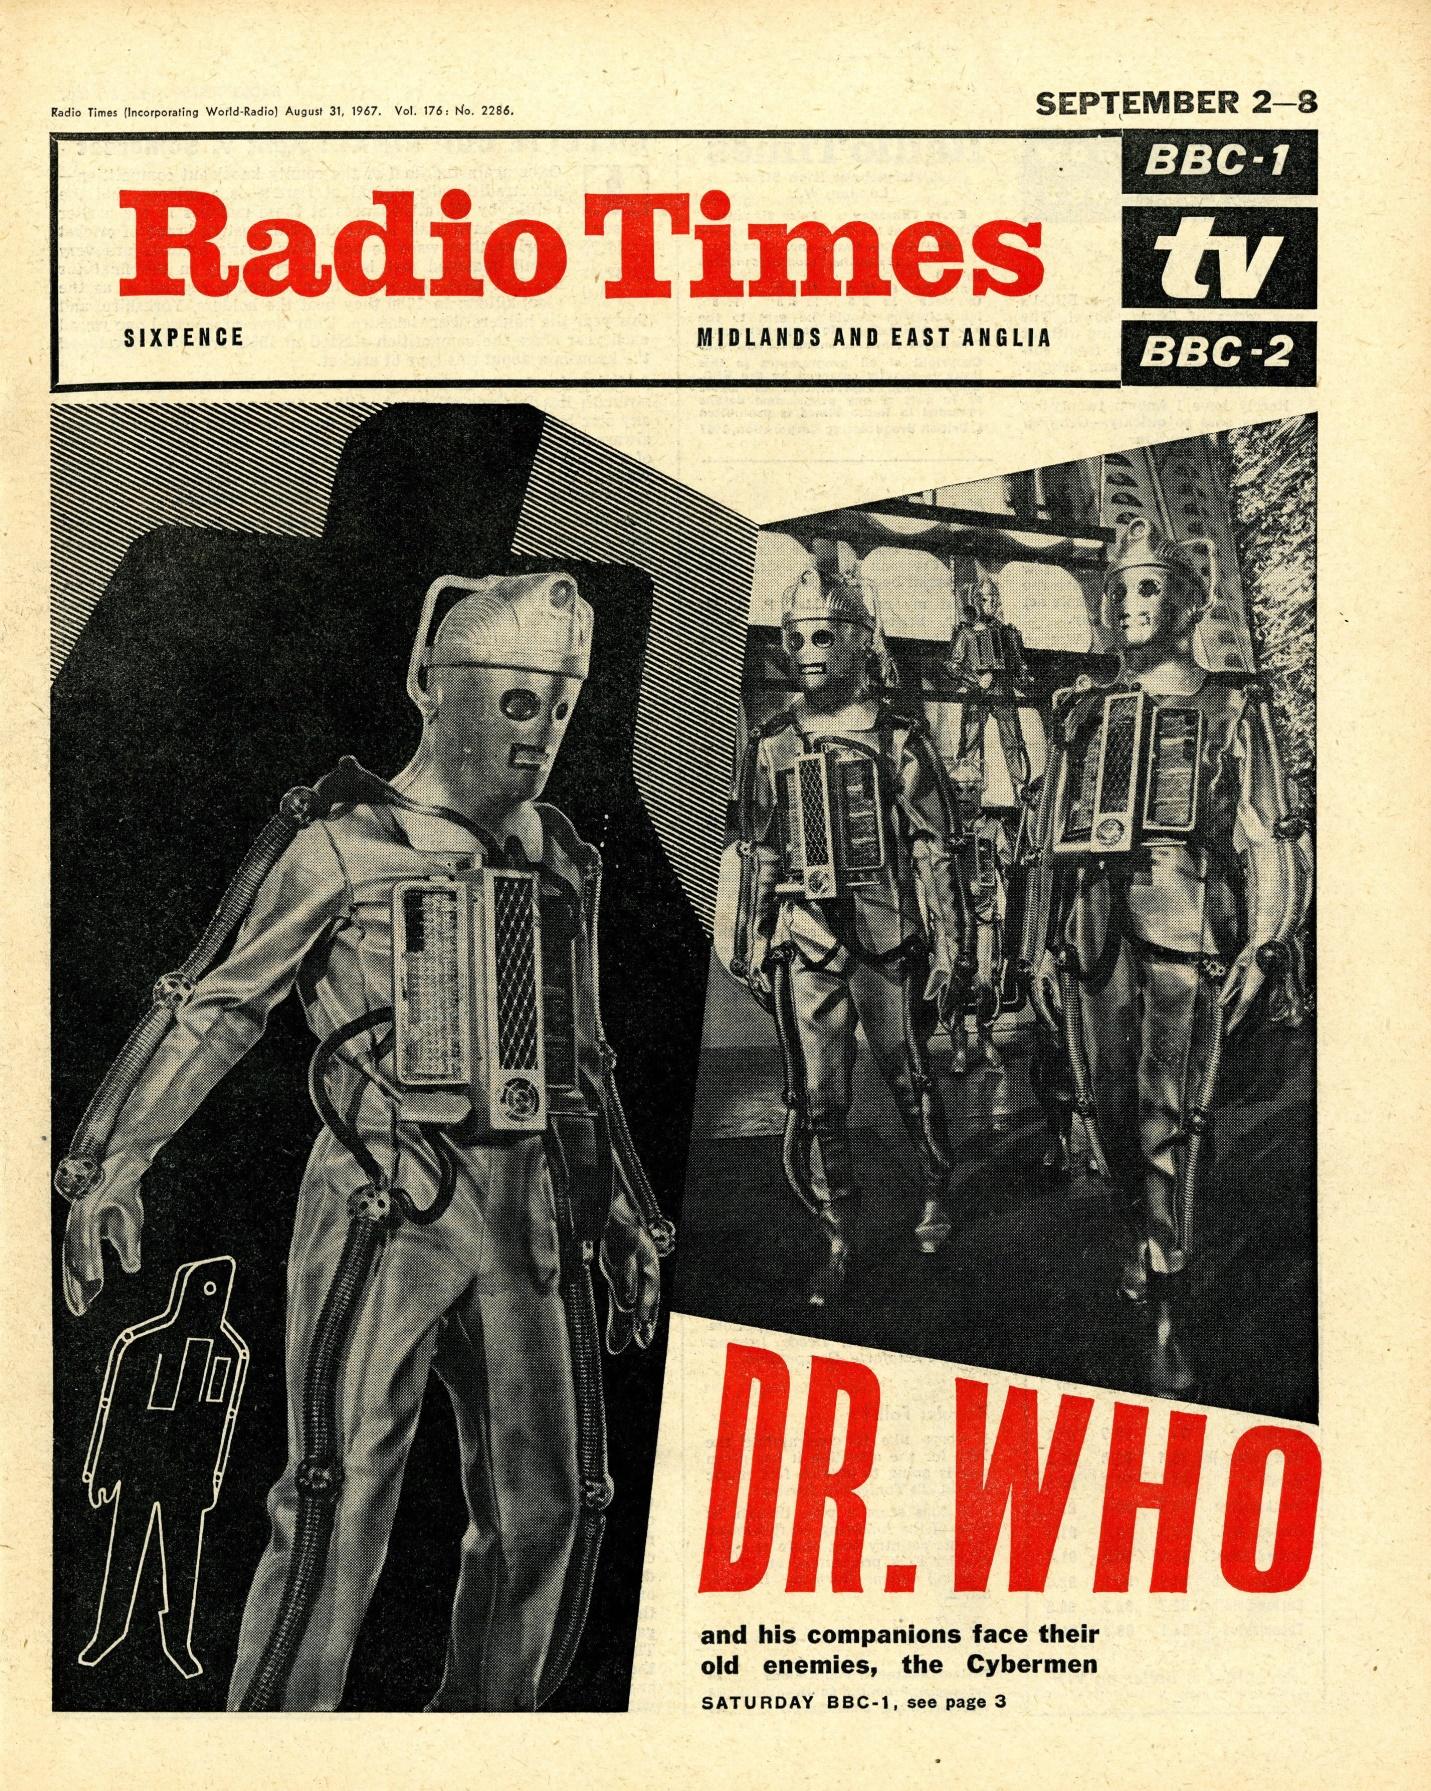 Radio Times, 2-8 September 1967